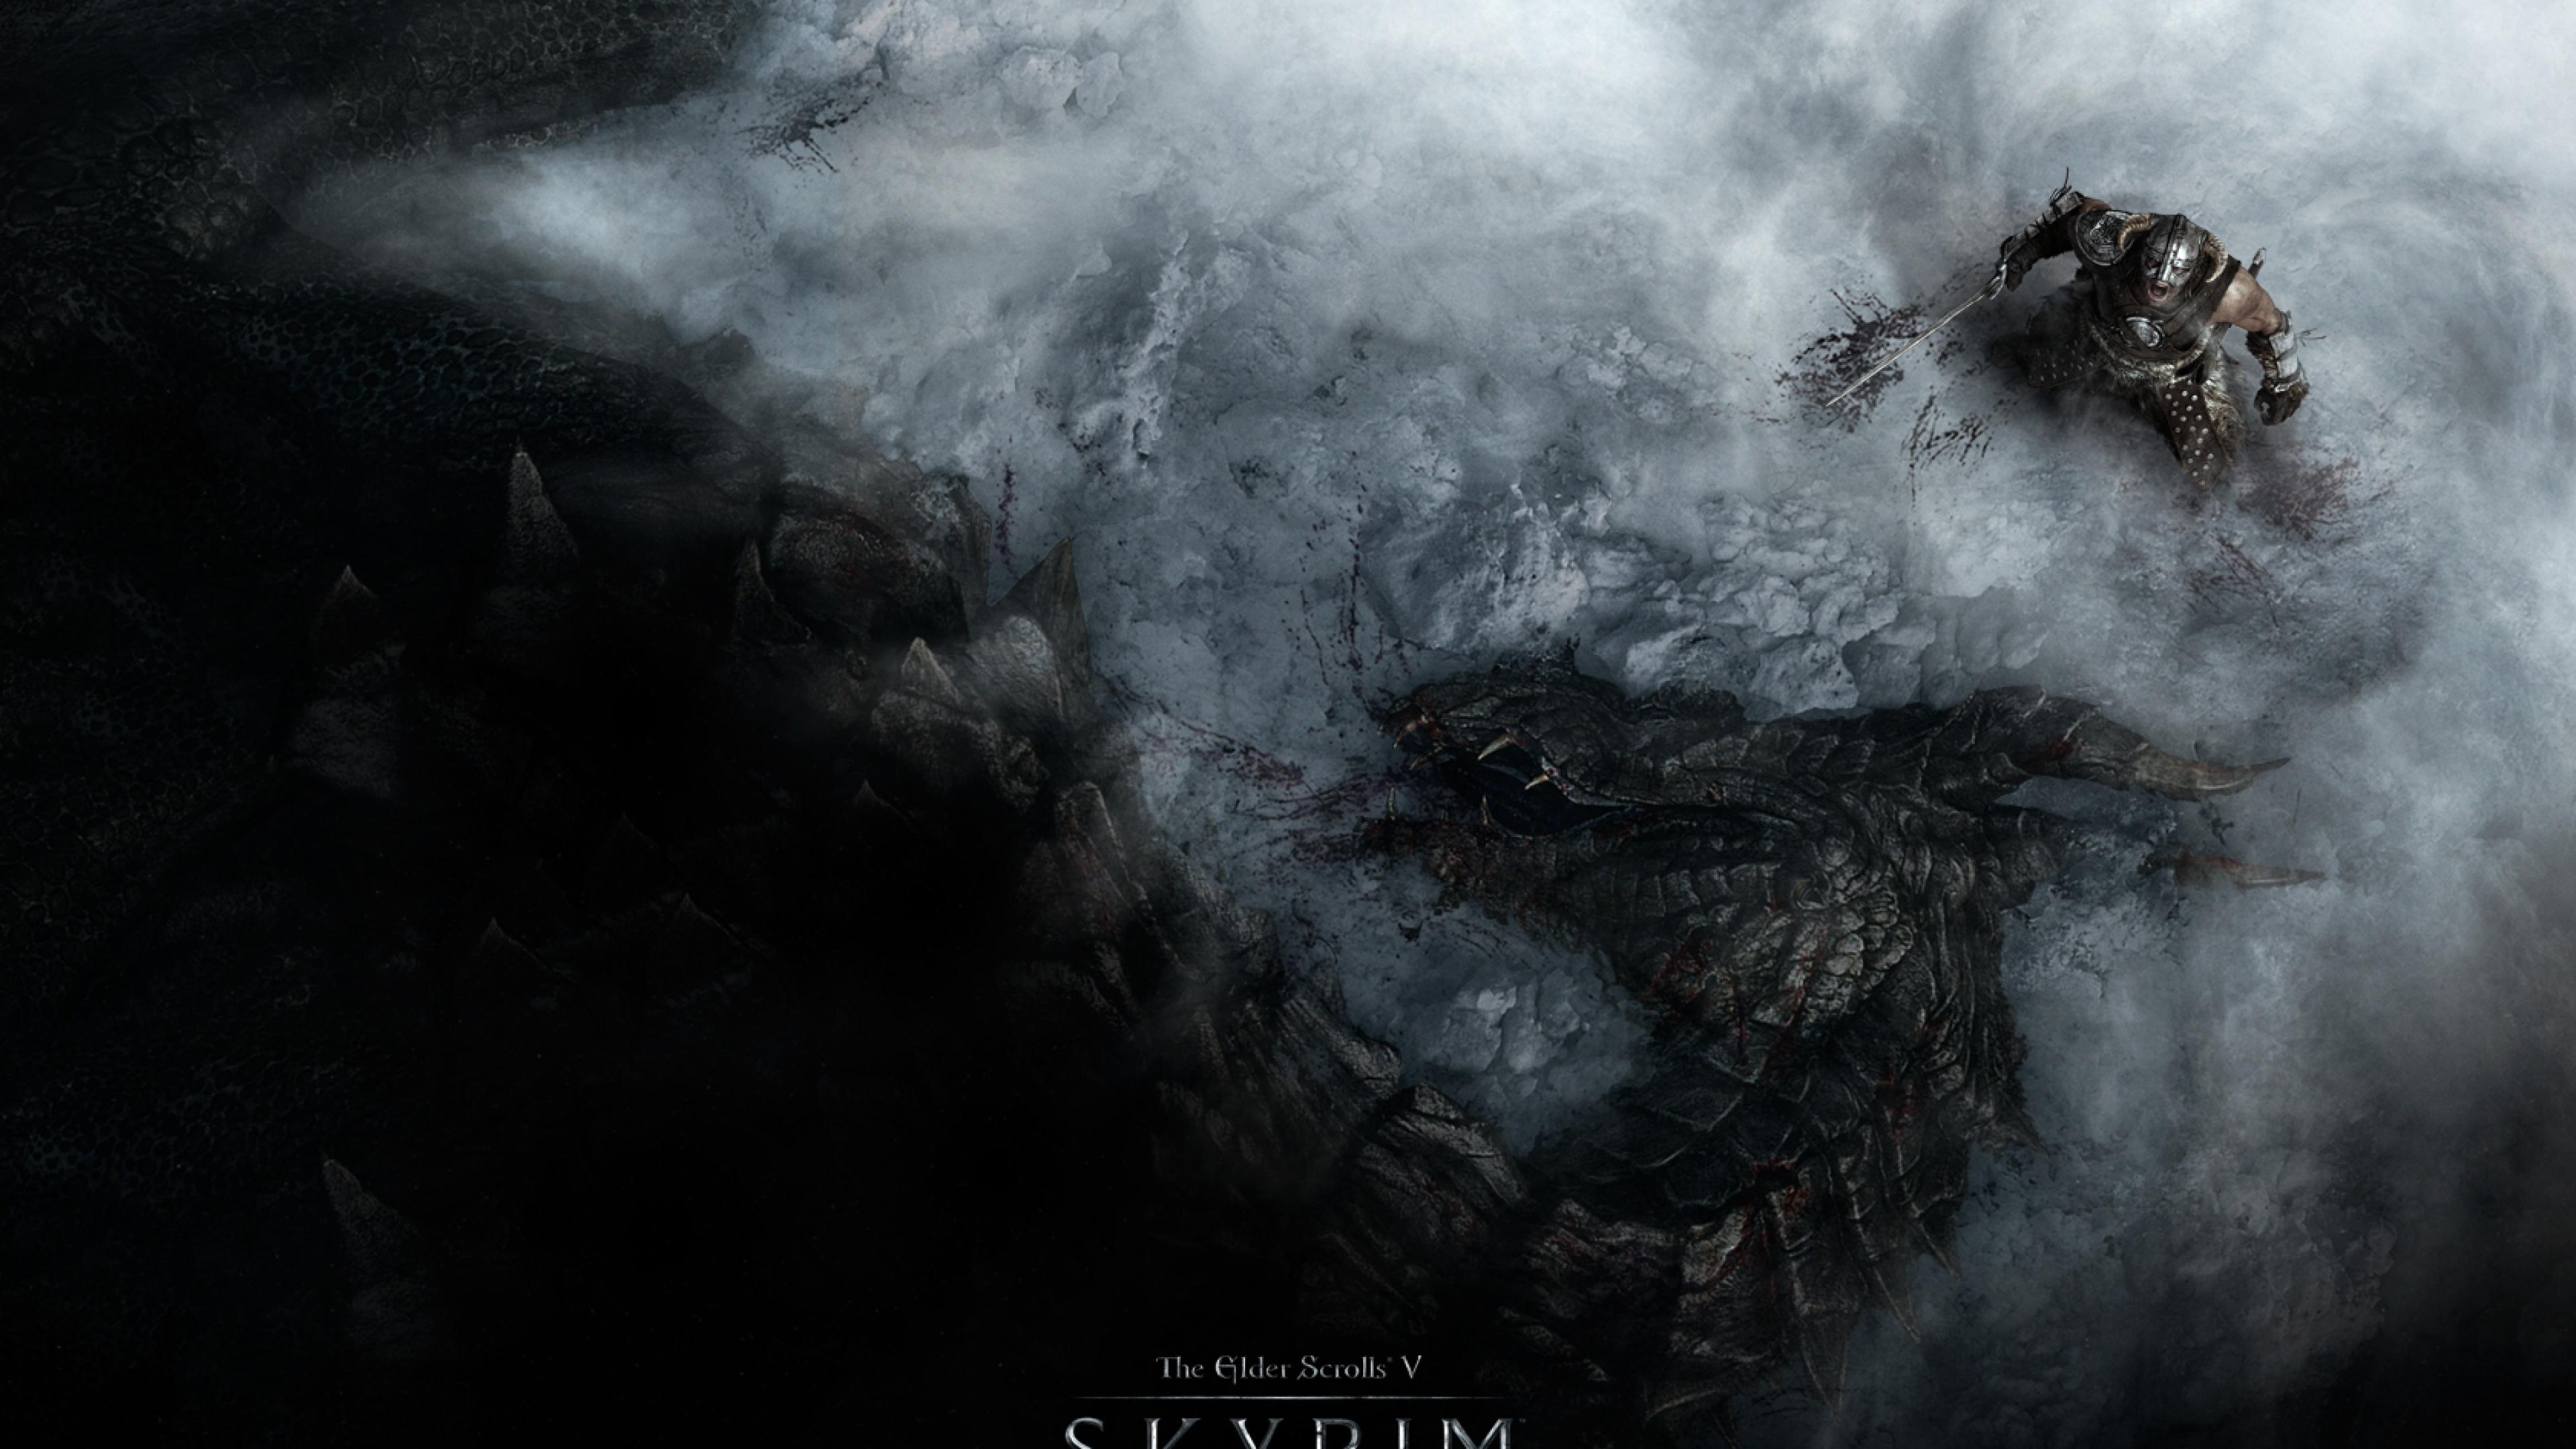 Download Wallpaper 3840x2160 The elder scrolls skyrim Warrior Dragon 3840x2160